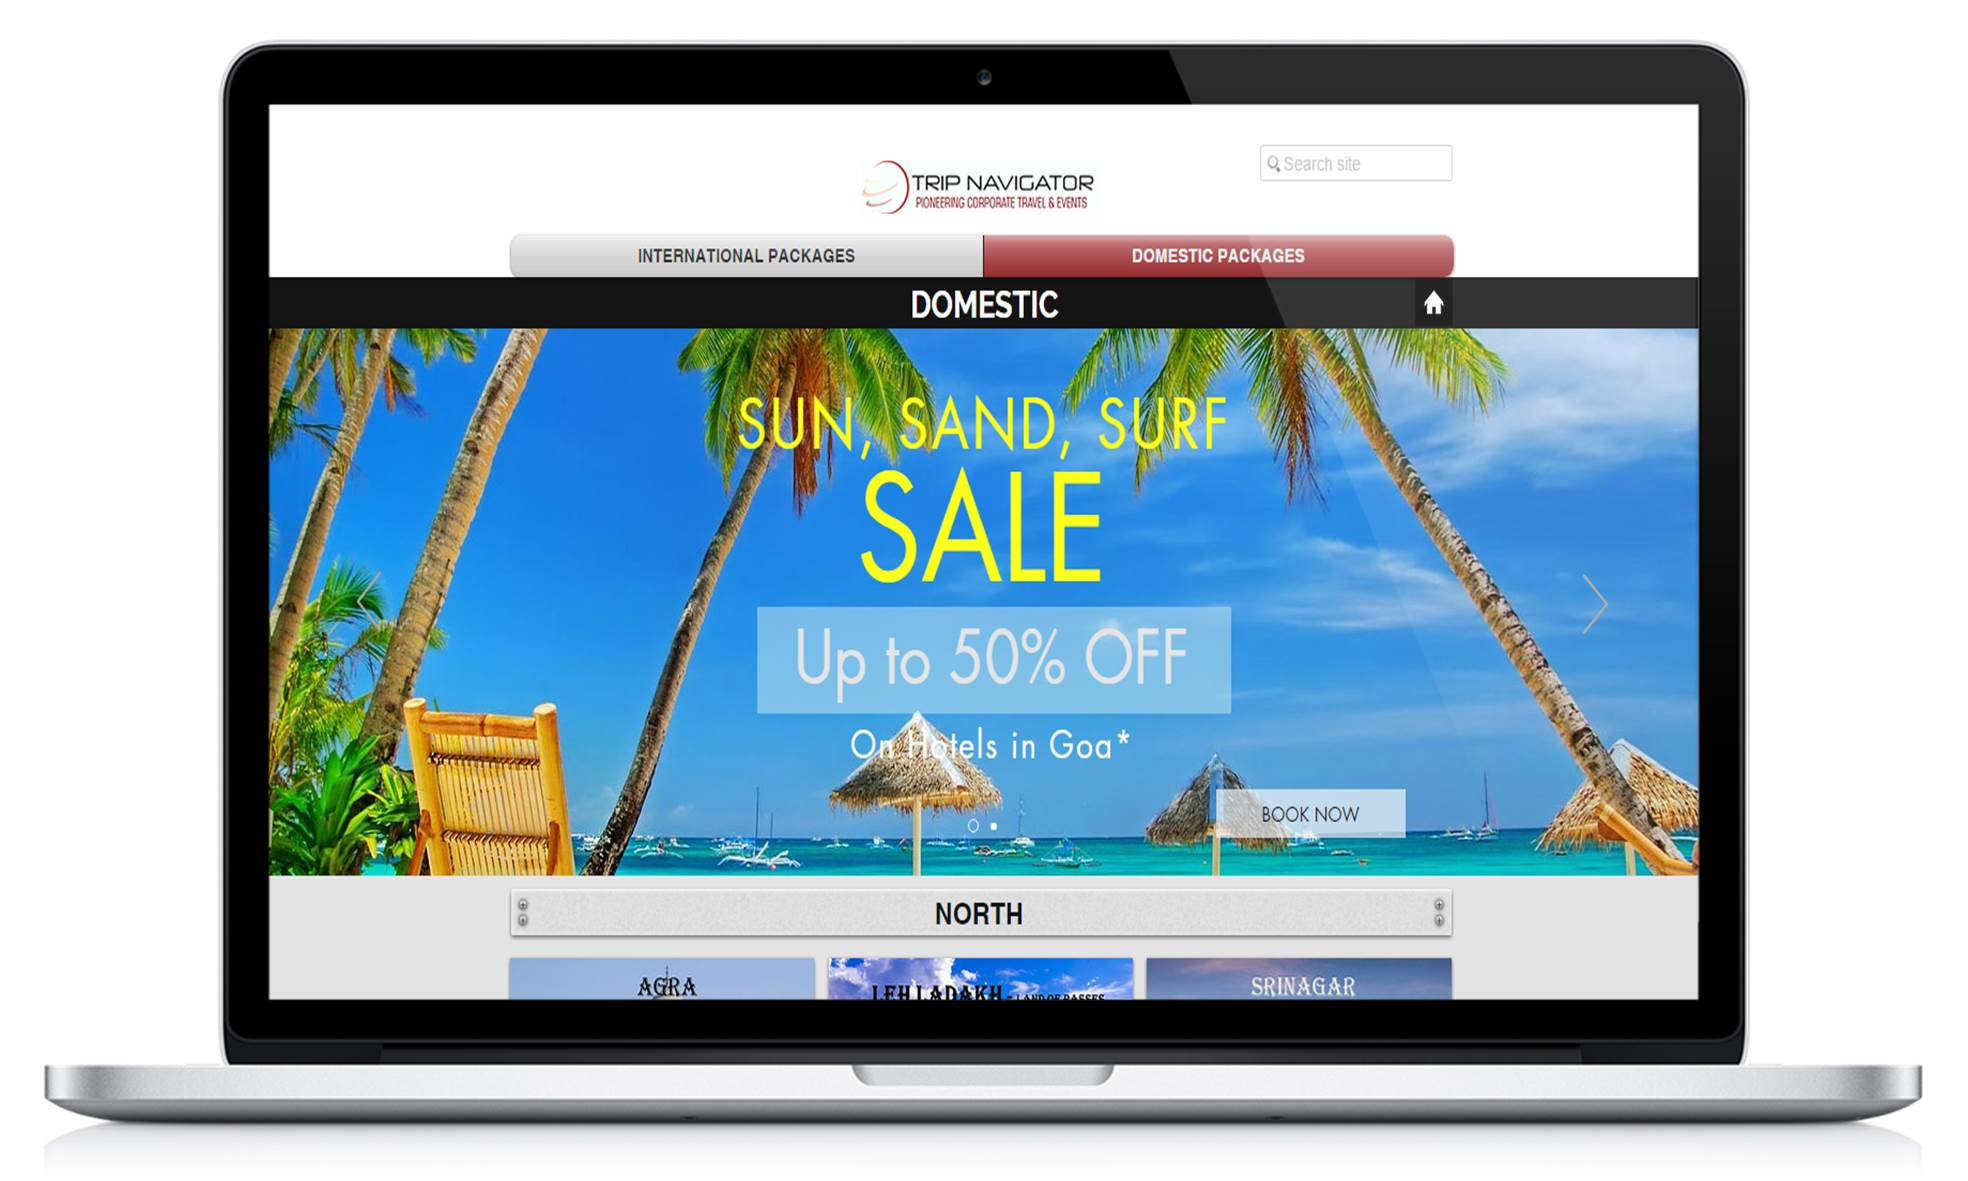 Web banner for Trip Navigator